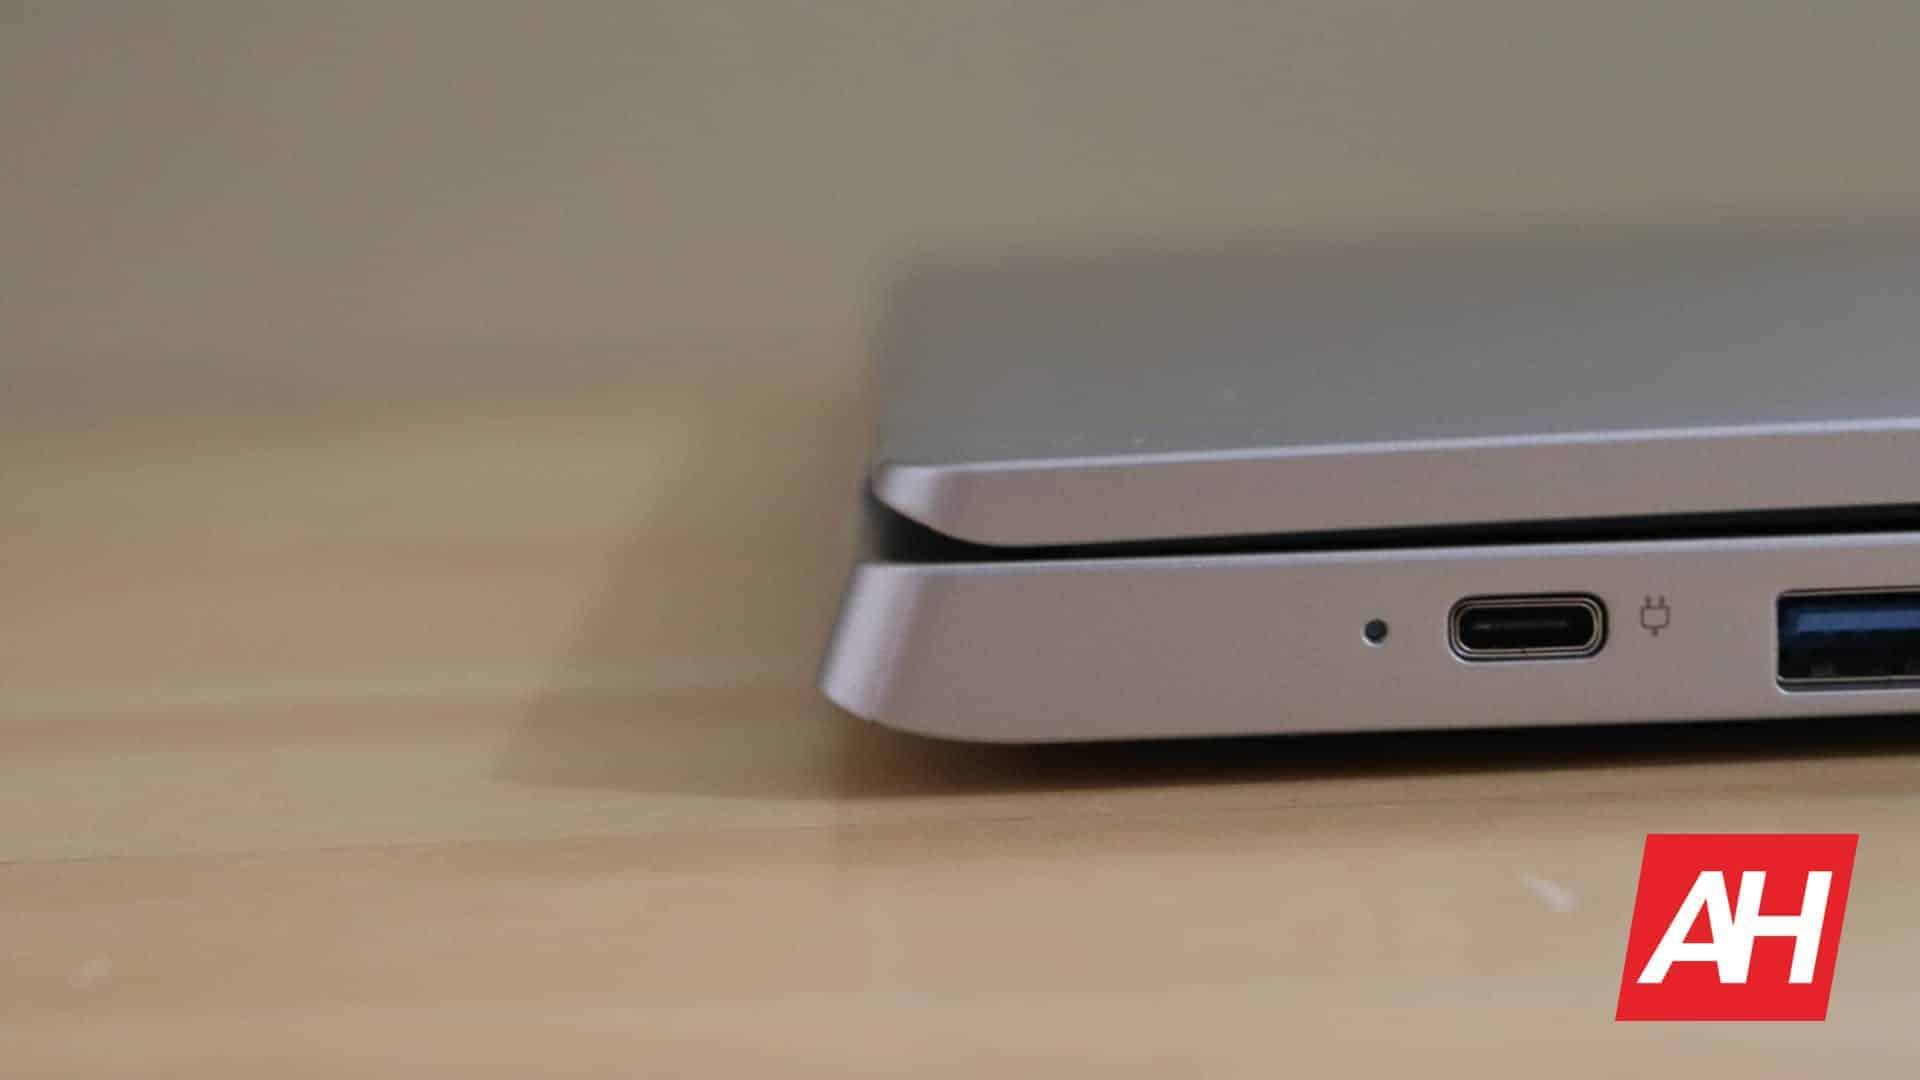 01 4 Lenovo IdeaPad 3 14 Chromebook AH 2020